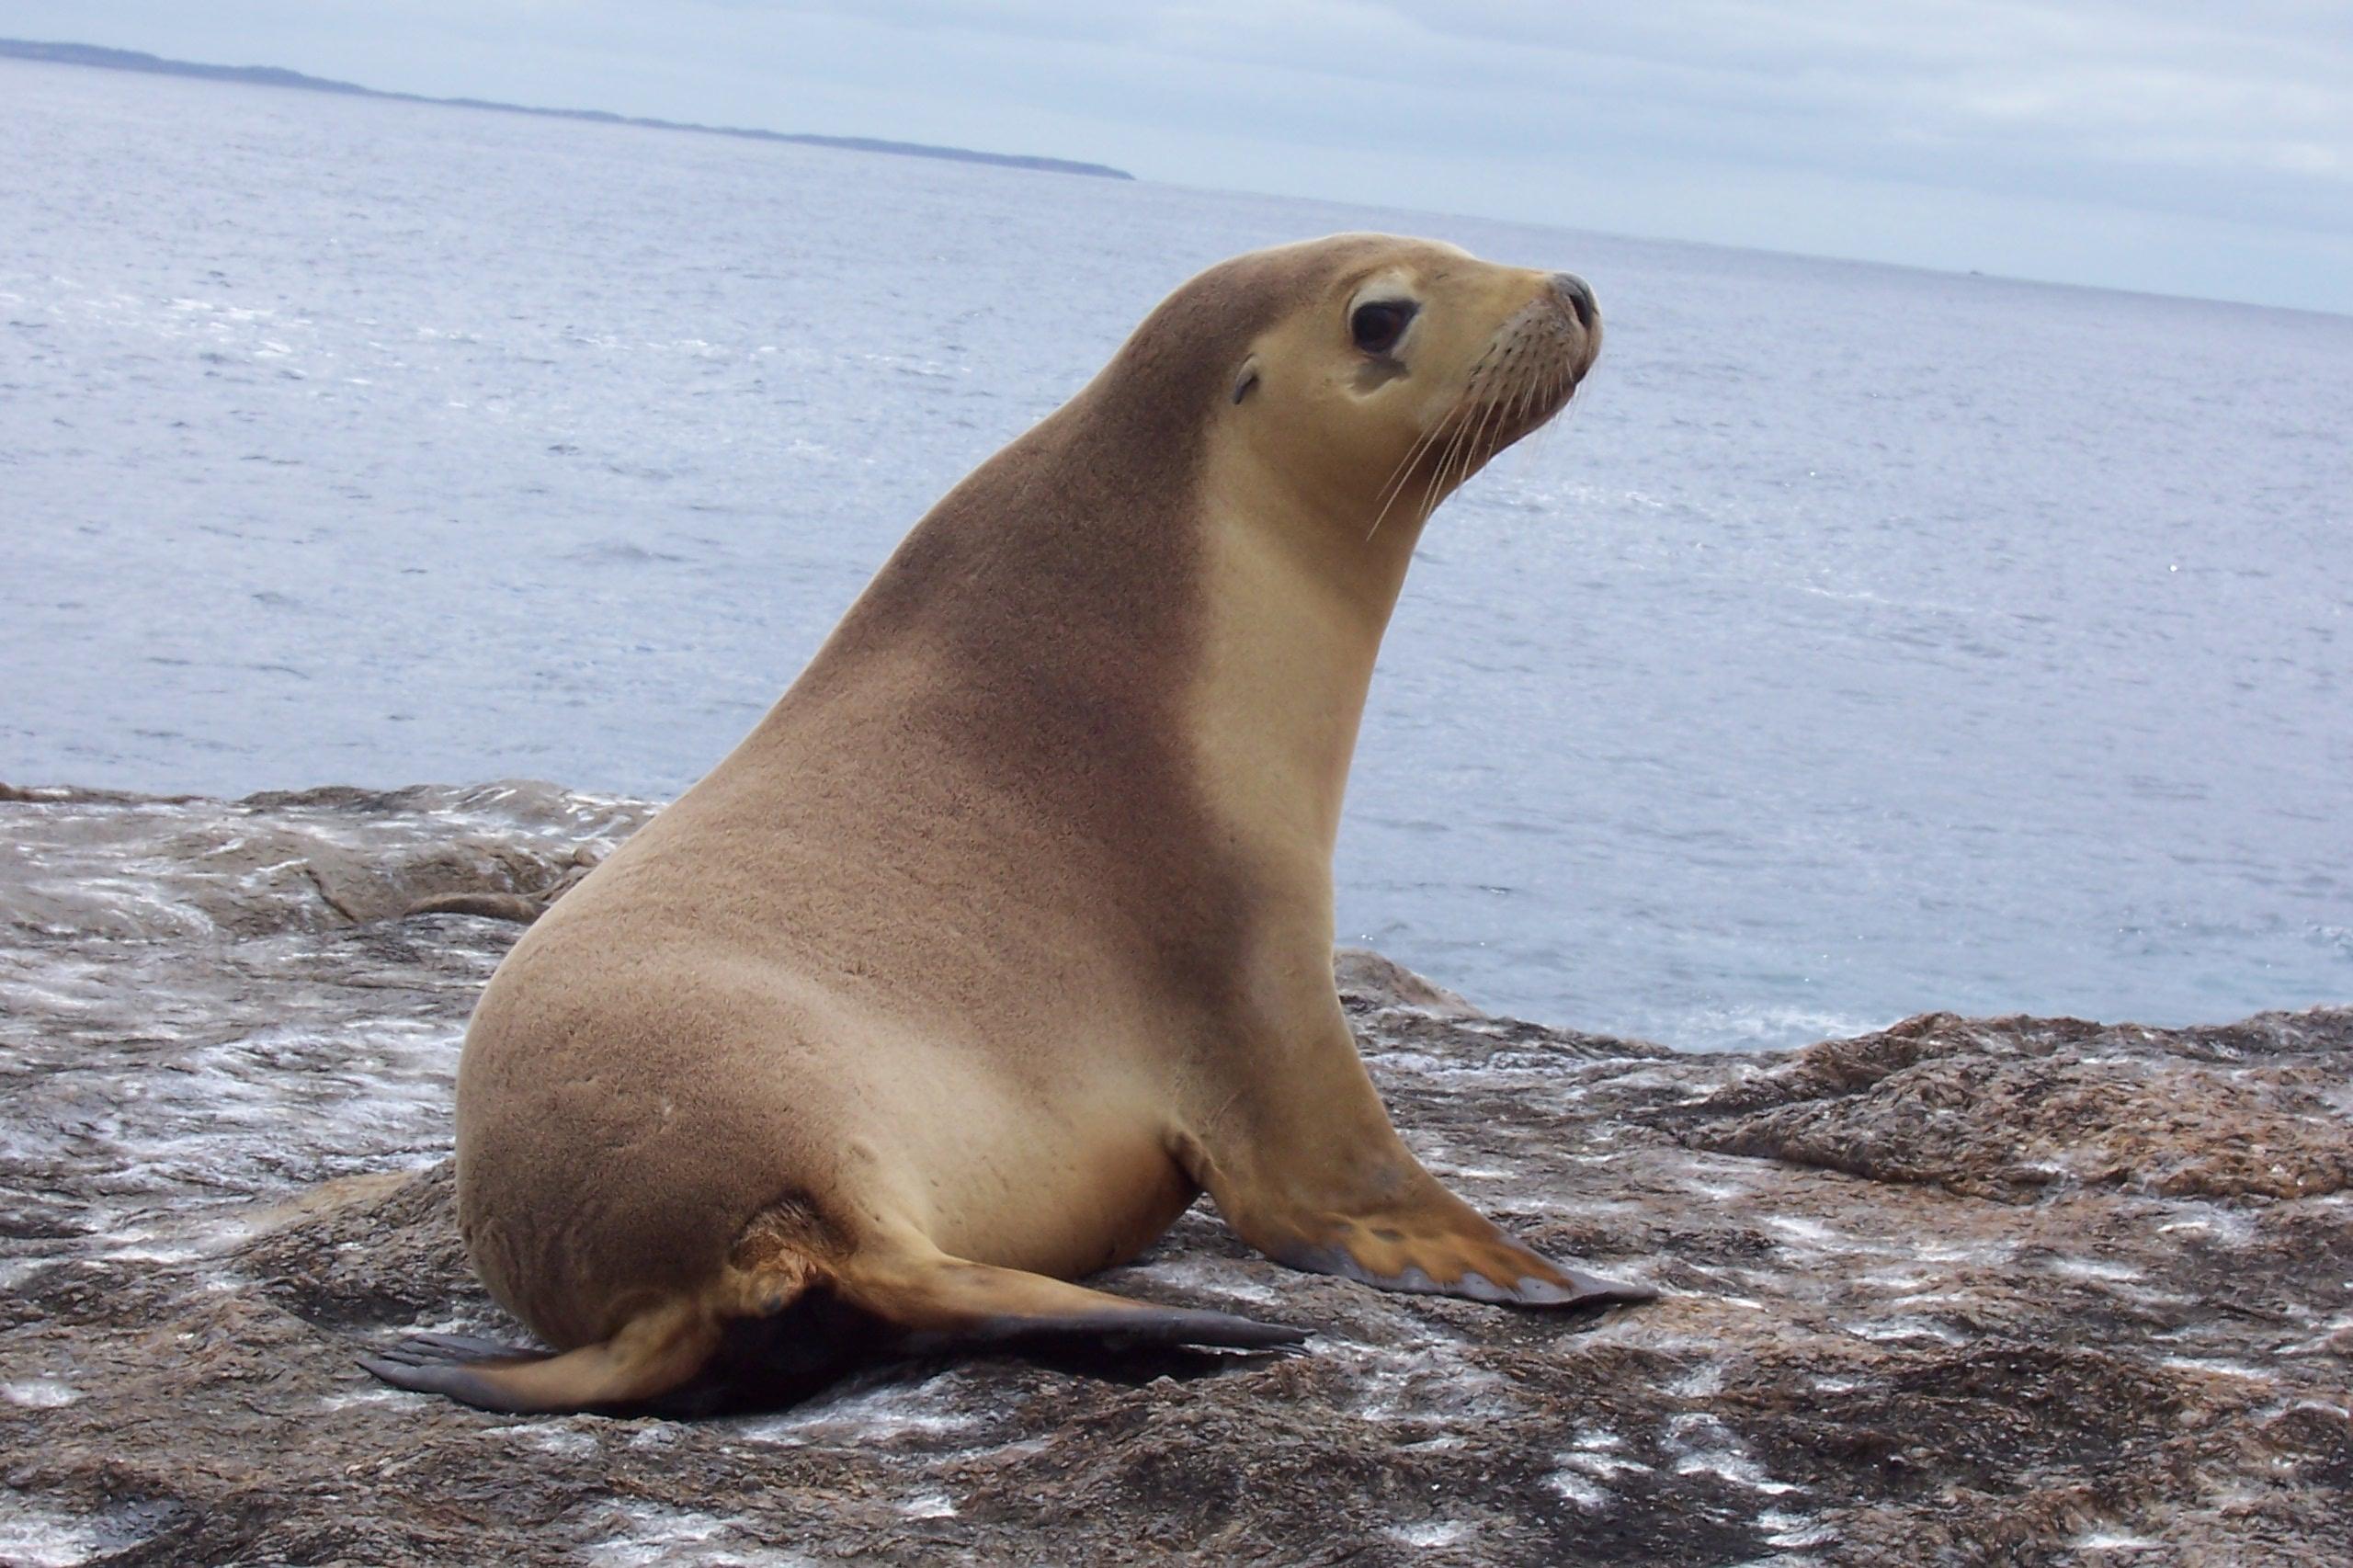 صور اسد البحر    Photo sea lion